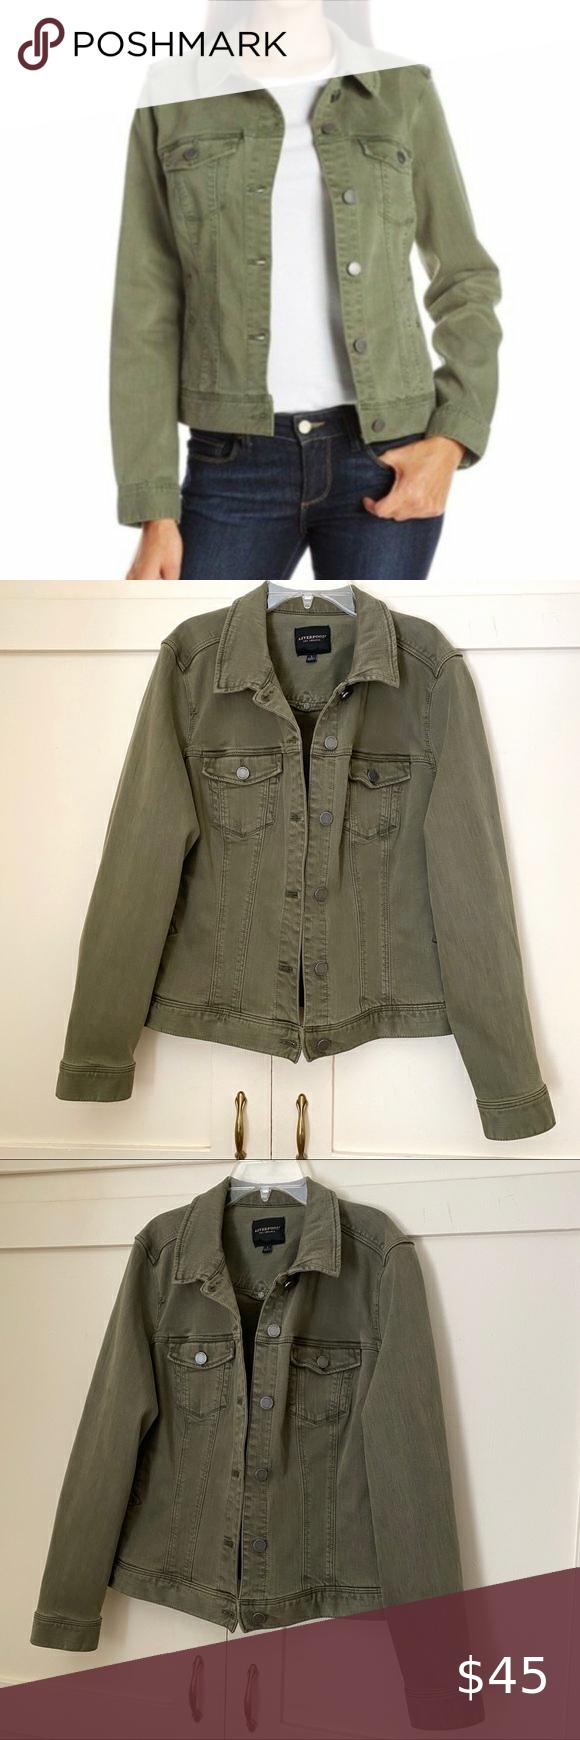 Liverpool Army Green Temma Denim Jacket Large Jackets Denim Jacket Liverpool Jeans [ 1740 x 580 Pixel ]